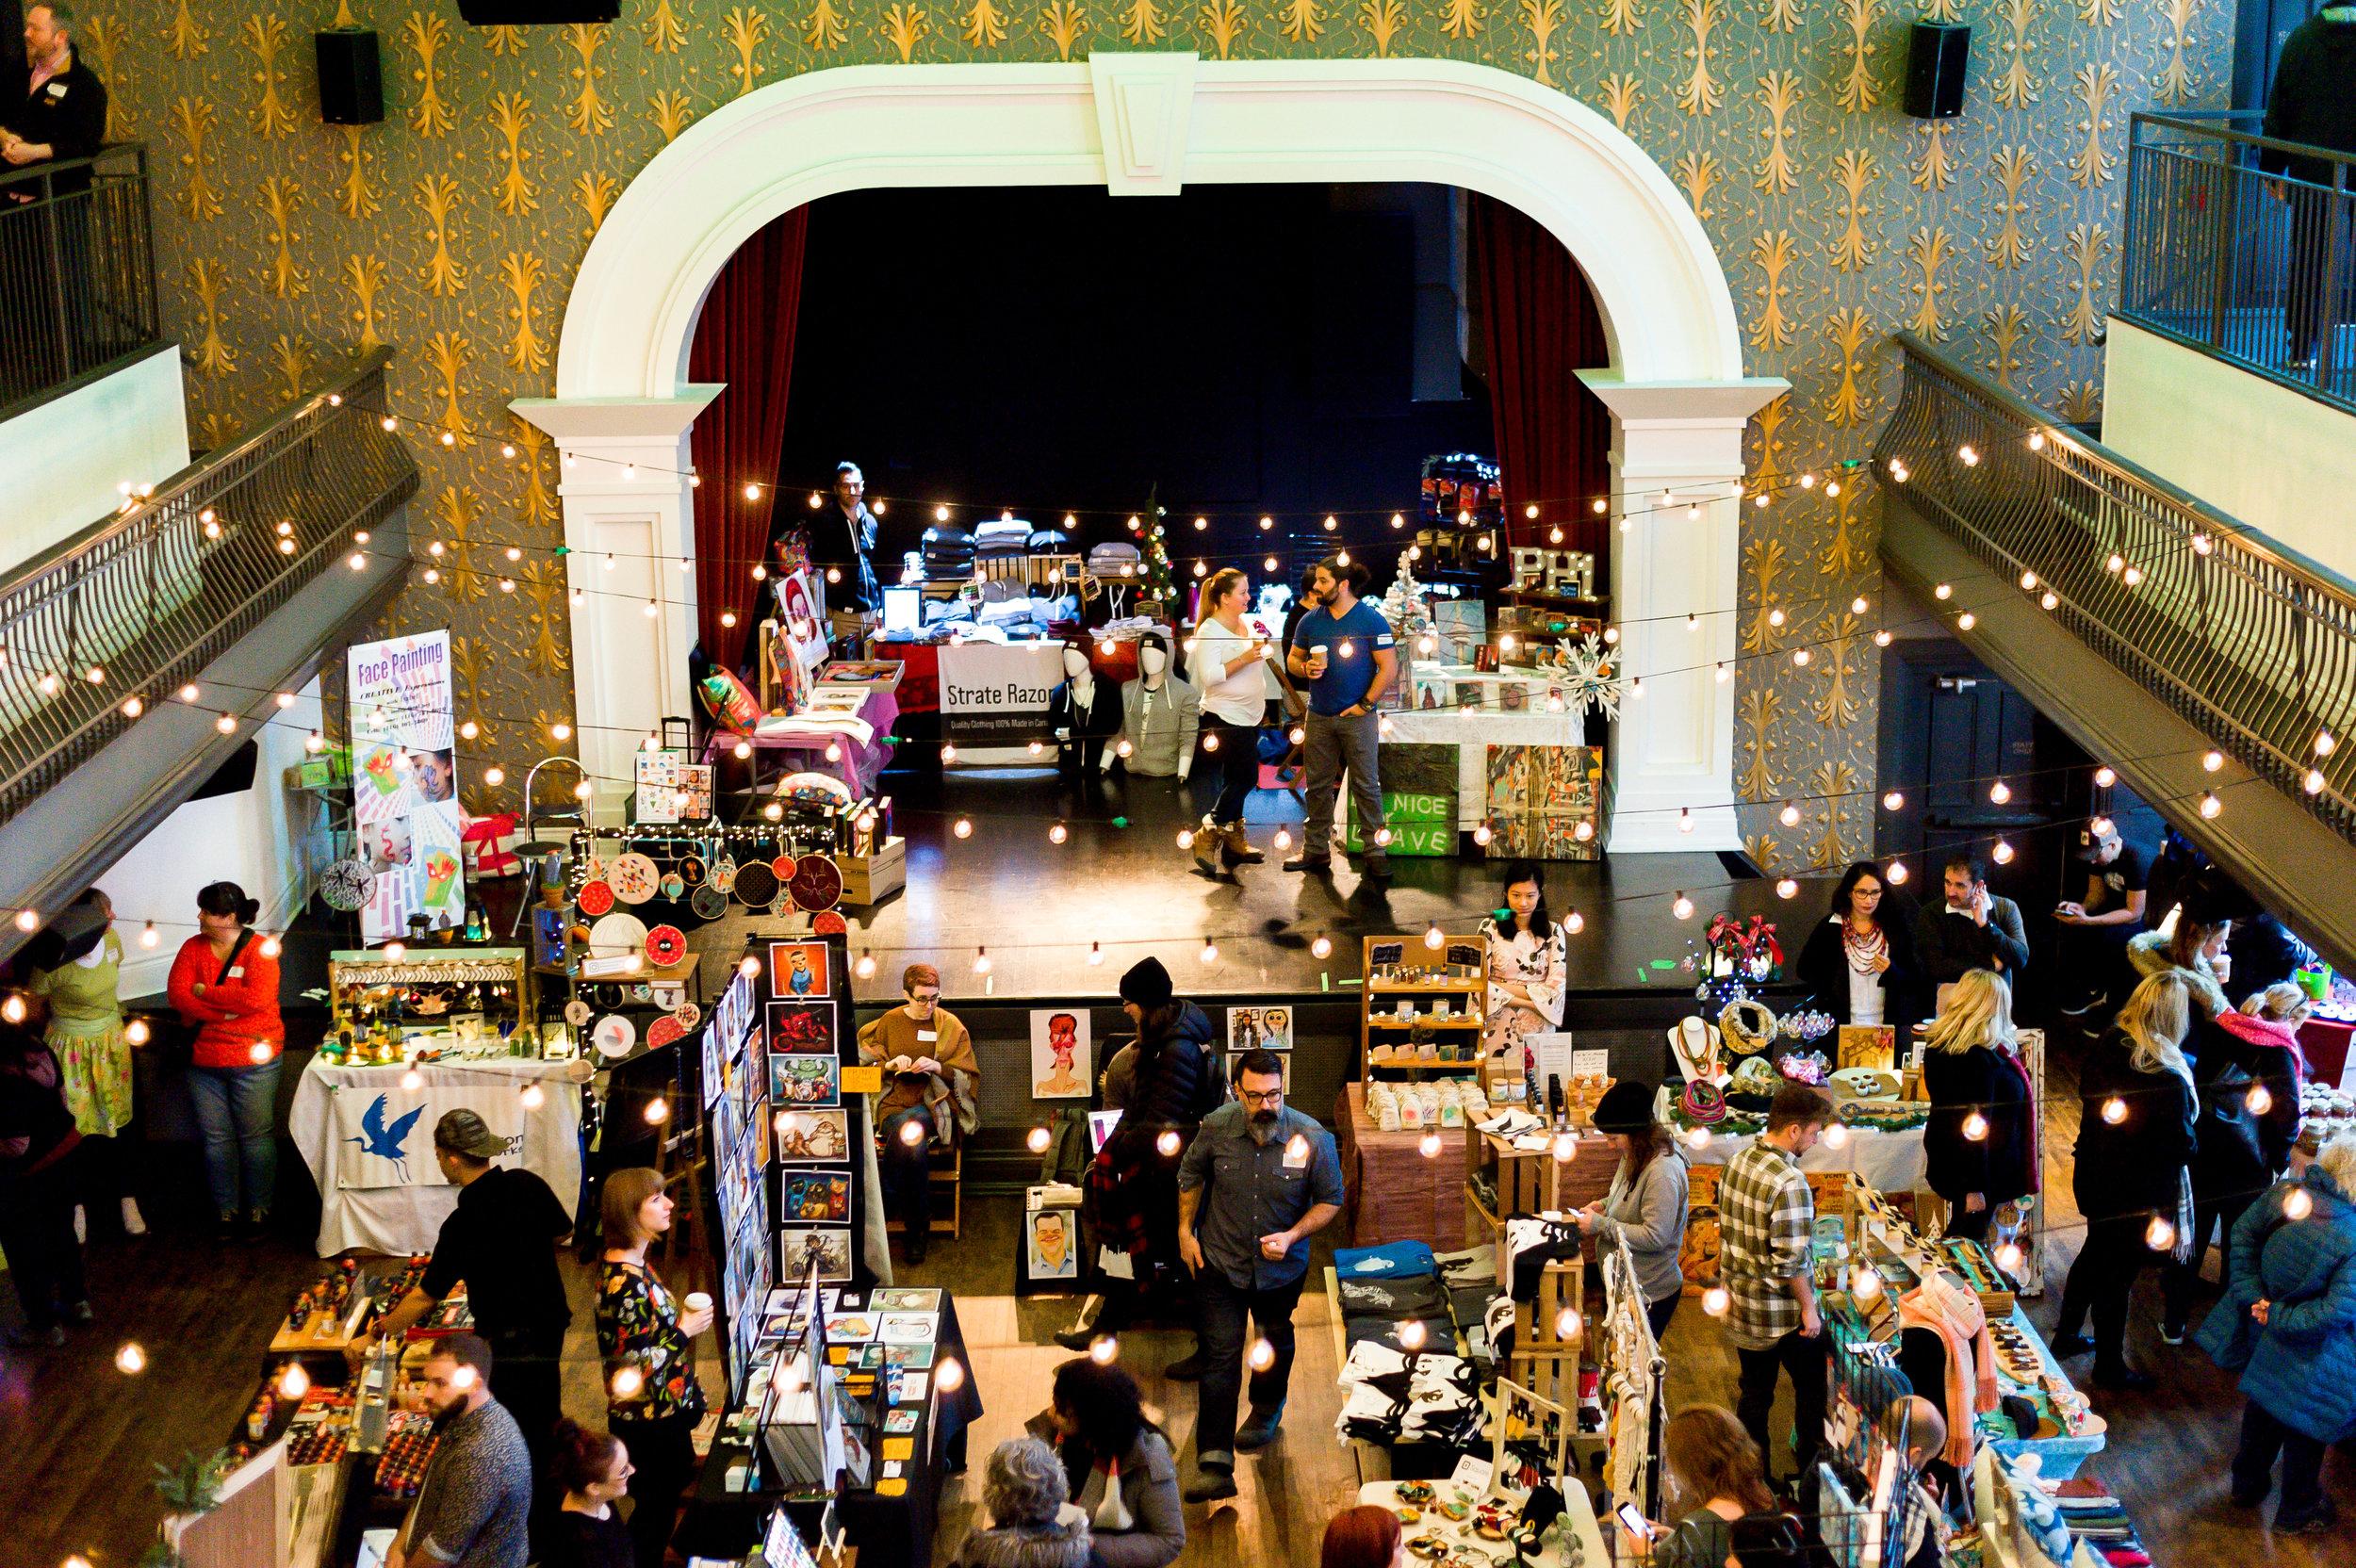 Toronto Art Crawl - Christmas Market-11 - Copy.jpg